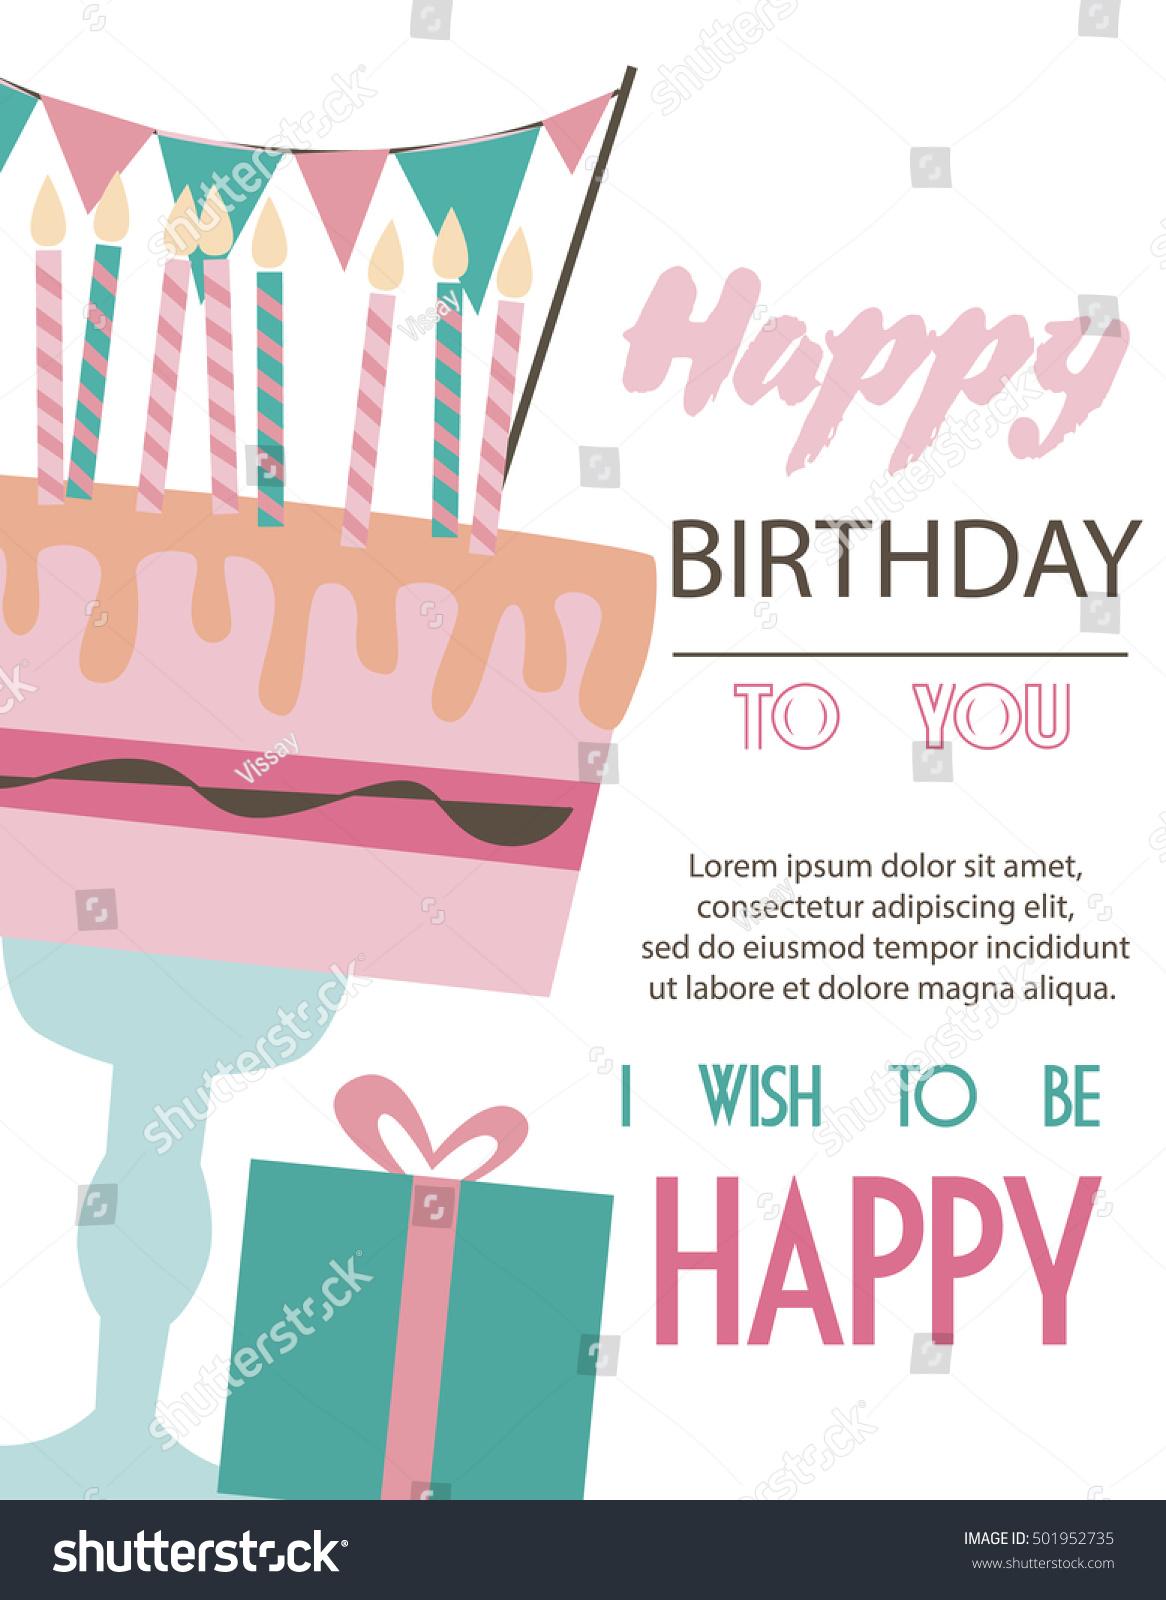 Cute Happy Birthday Card Invitation Greeting Stock Vector 501952735 ...